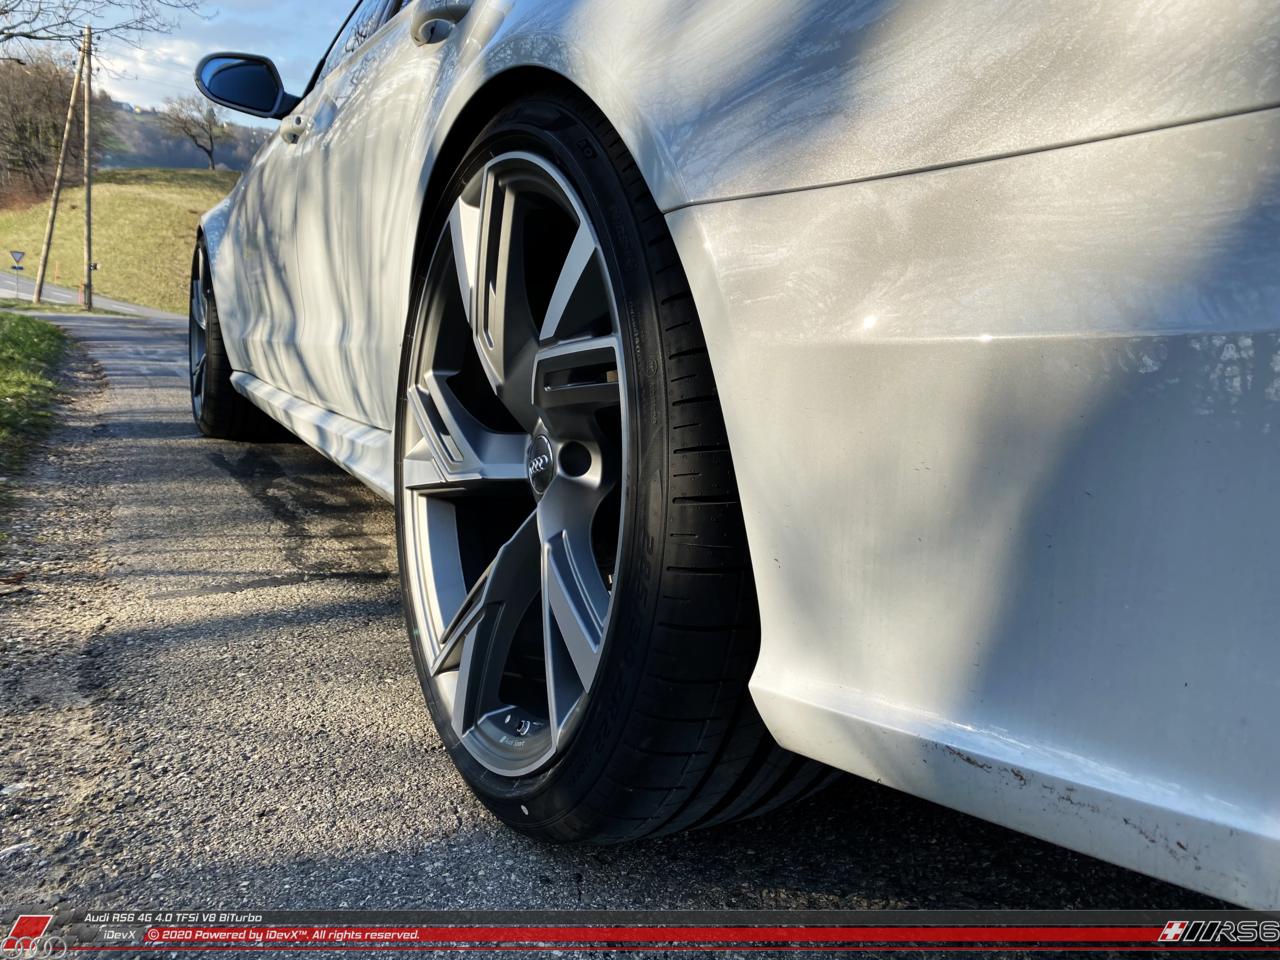 18.03.2020_Audi-RS6_iDevX_013.png